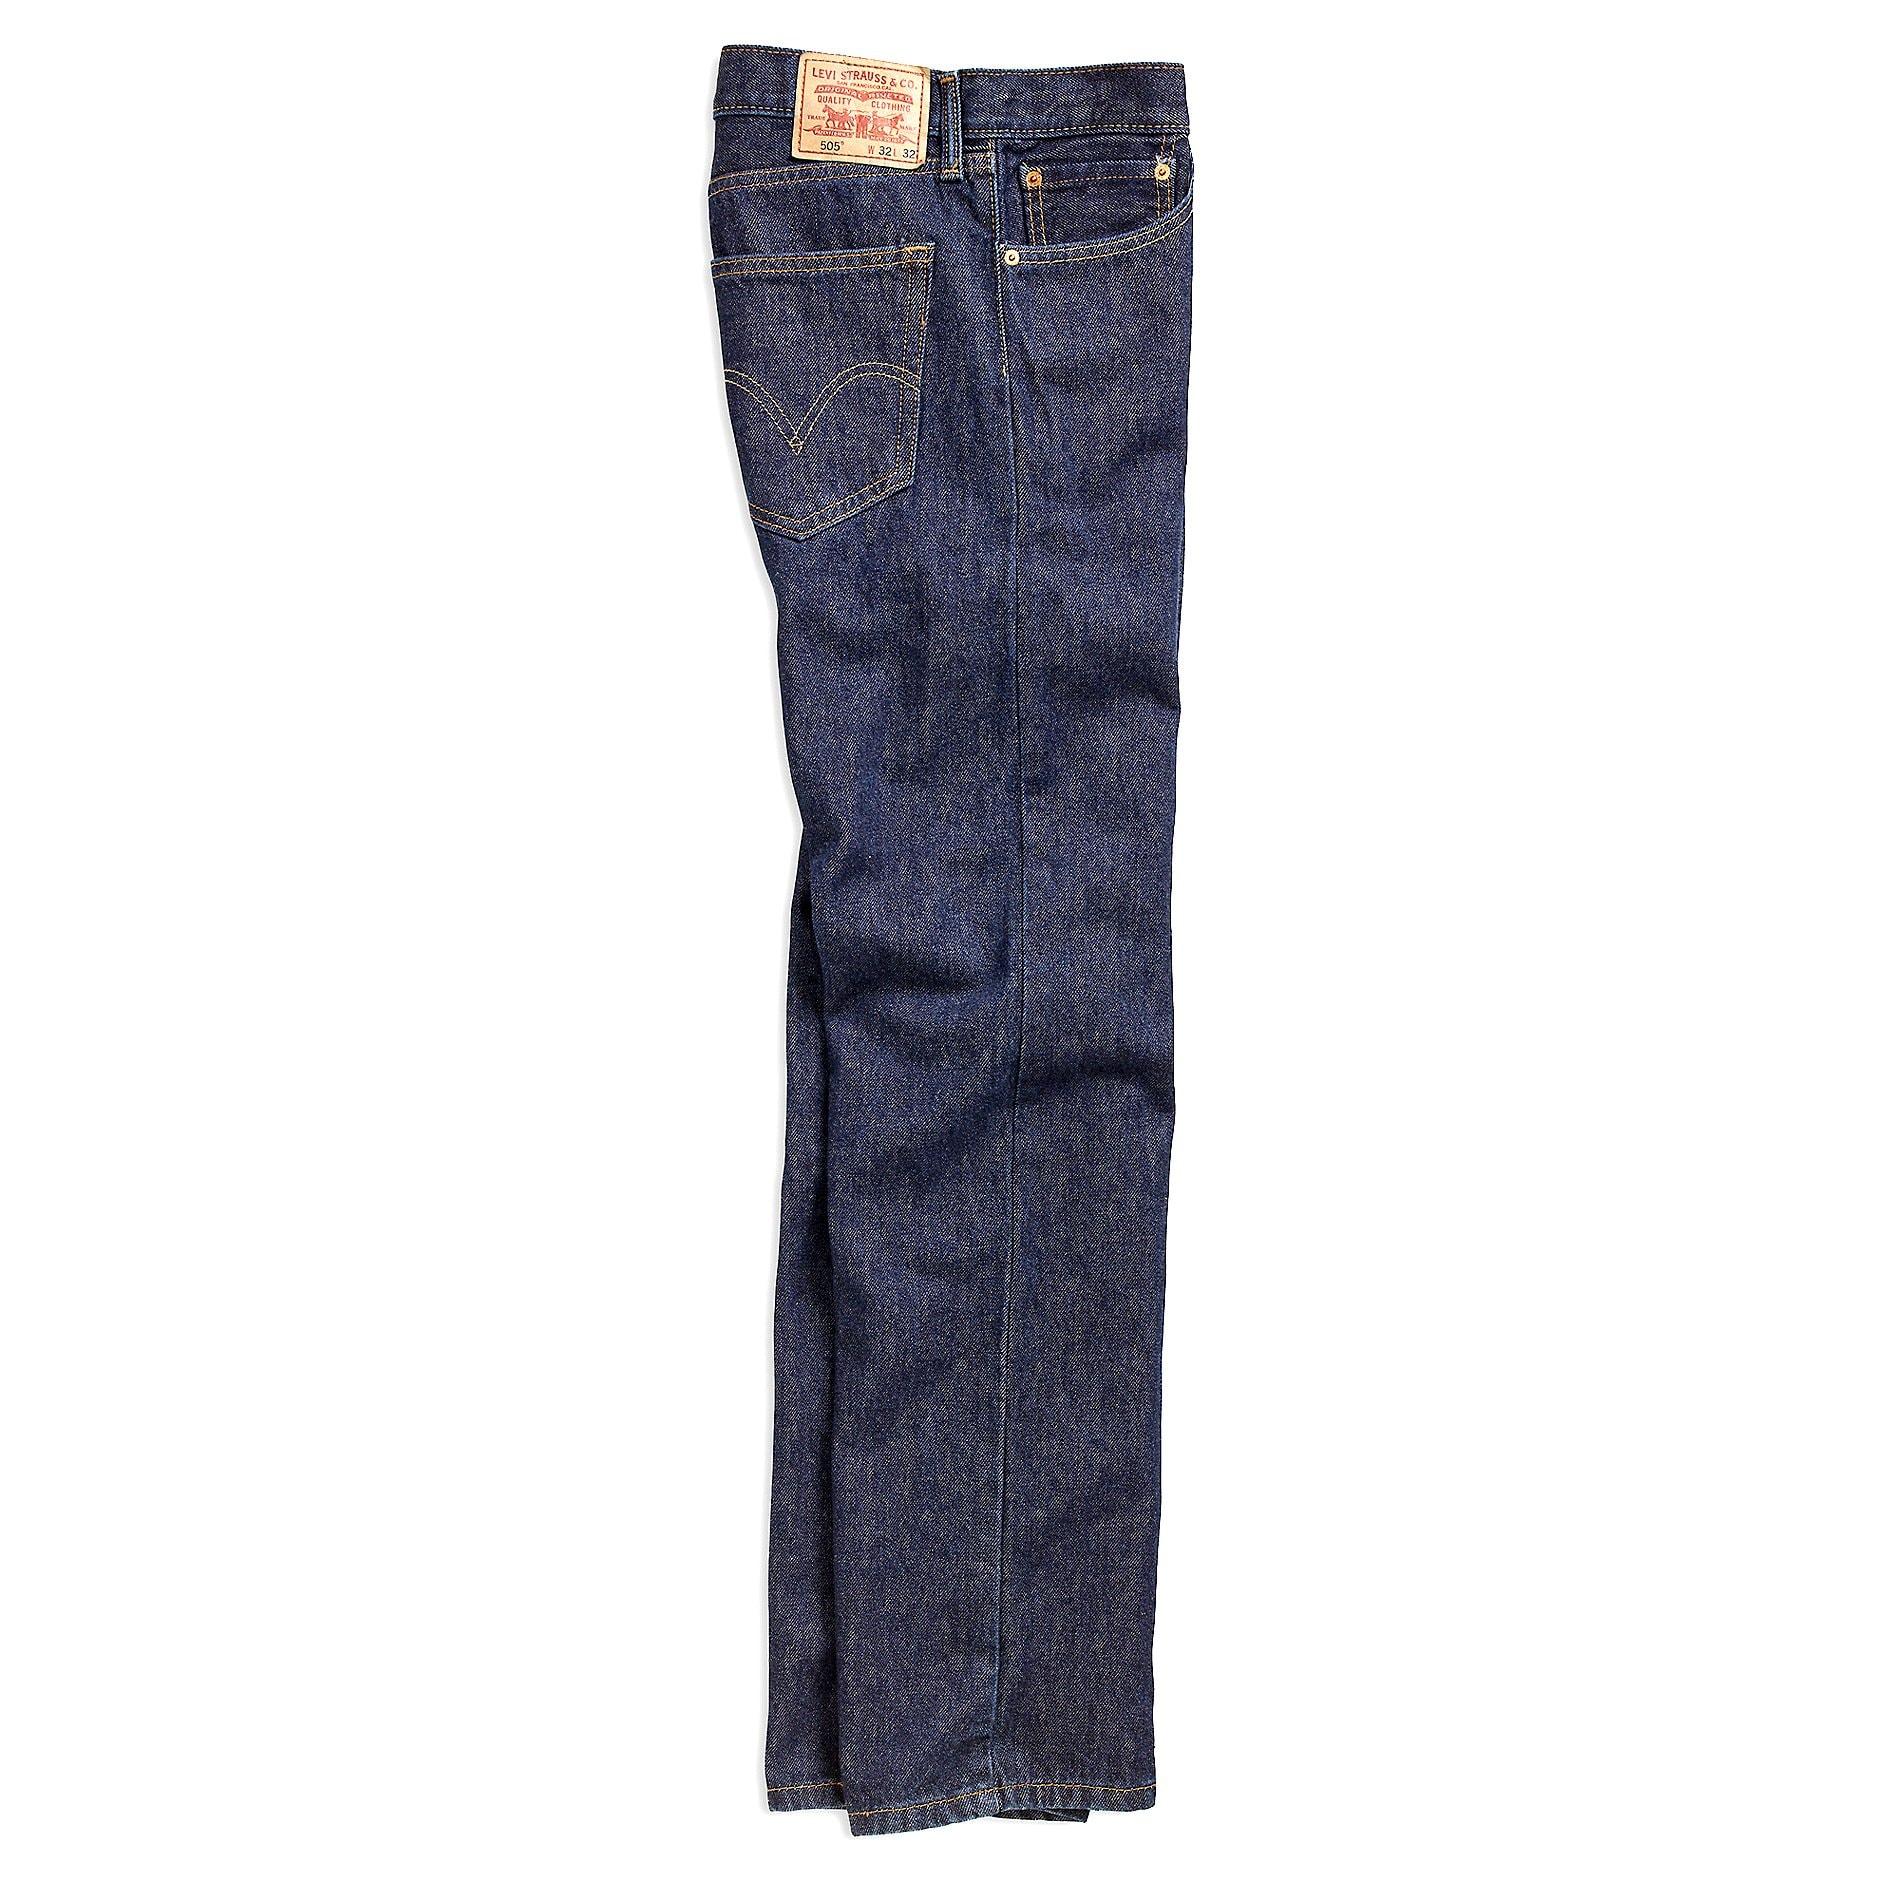 Jeans 505 Regular Fit Levi's